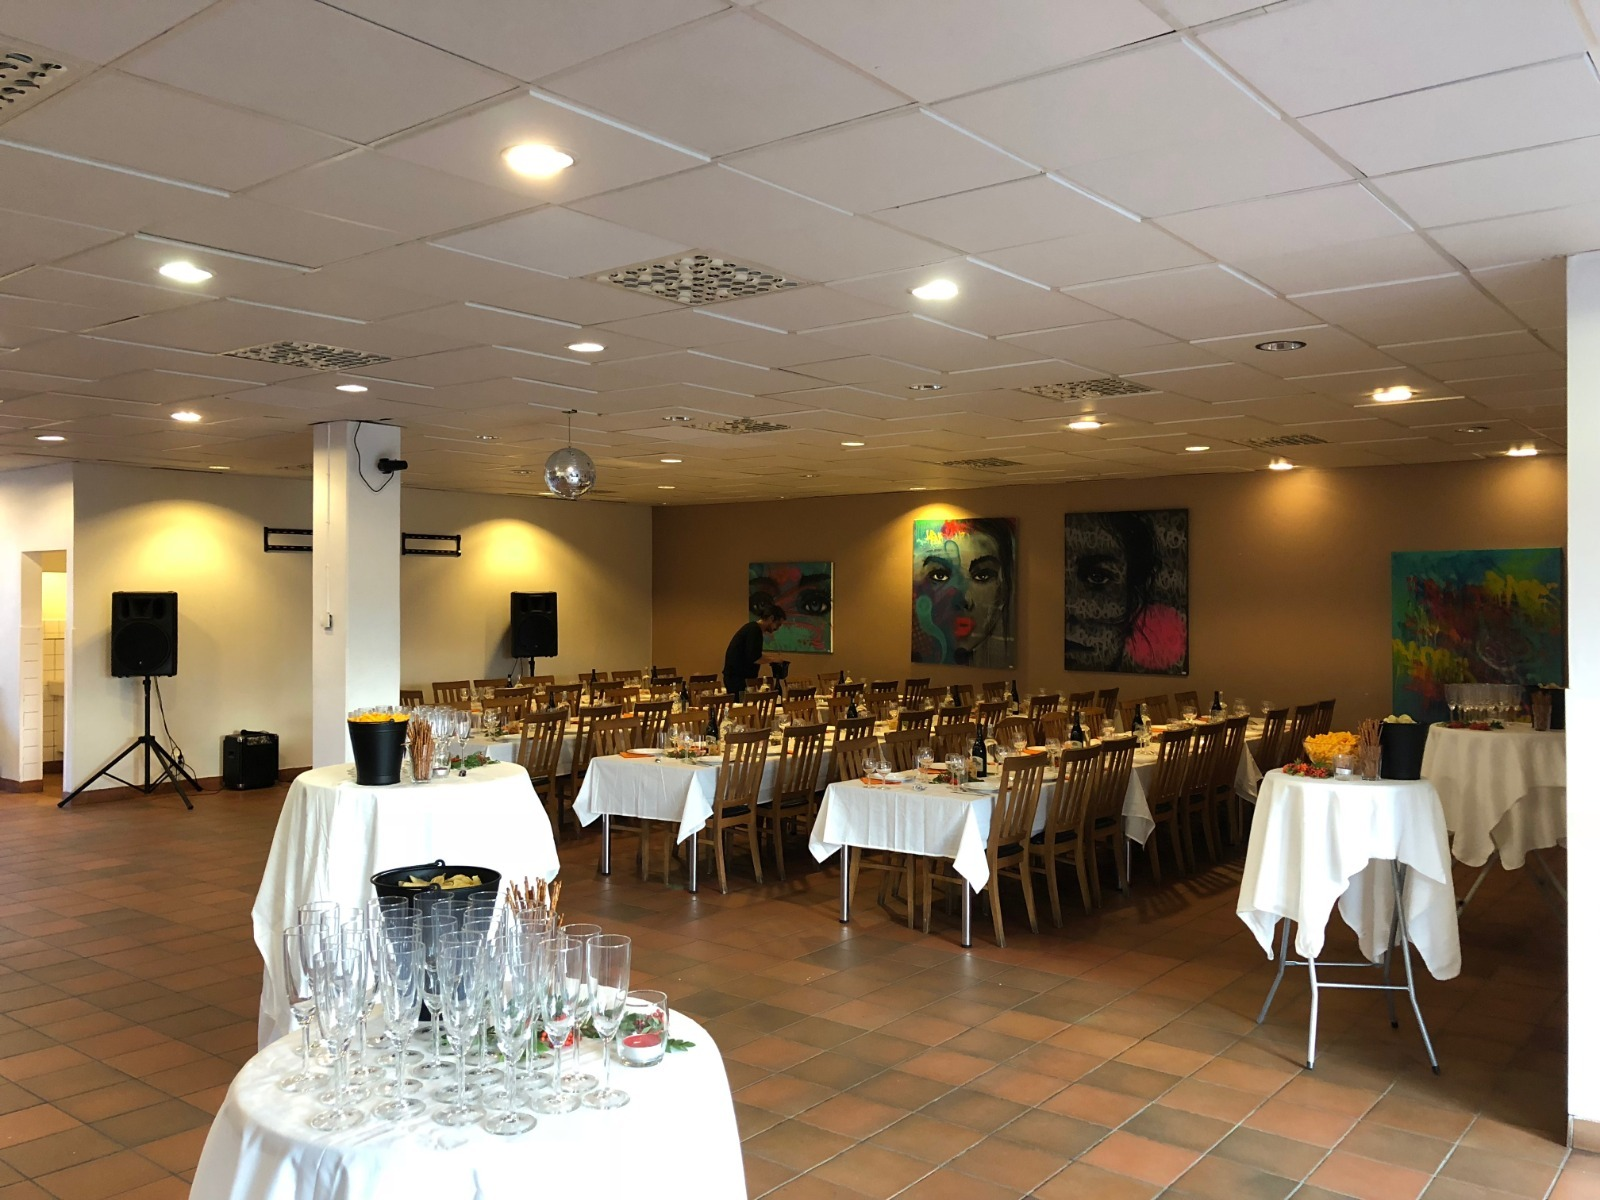 Lokanta eventlokal Måndag - Torsdag